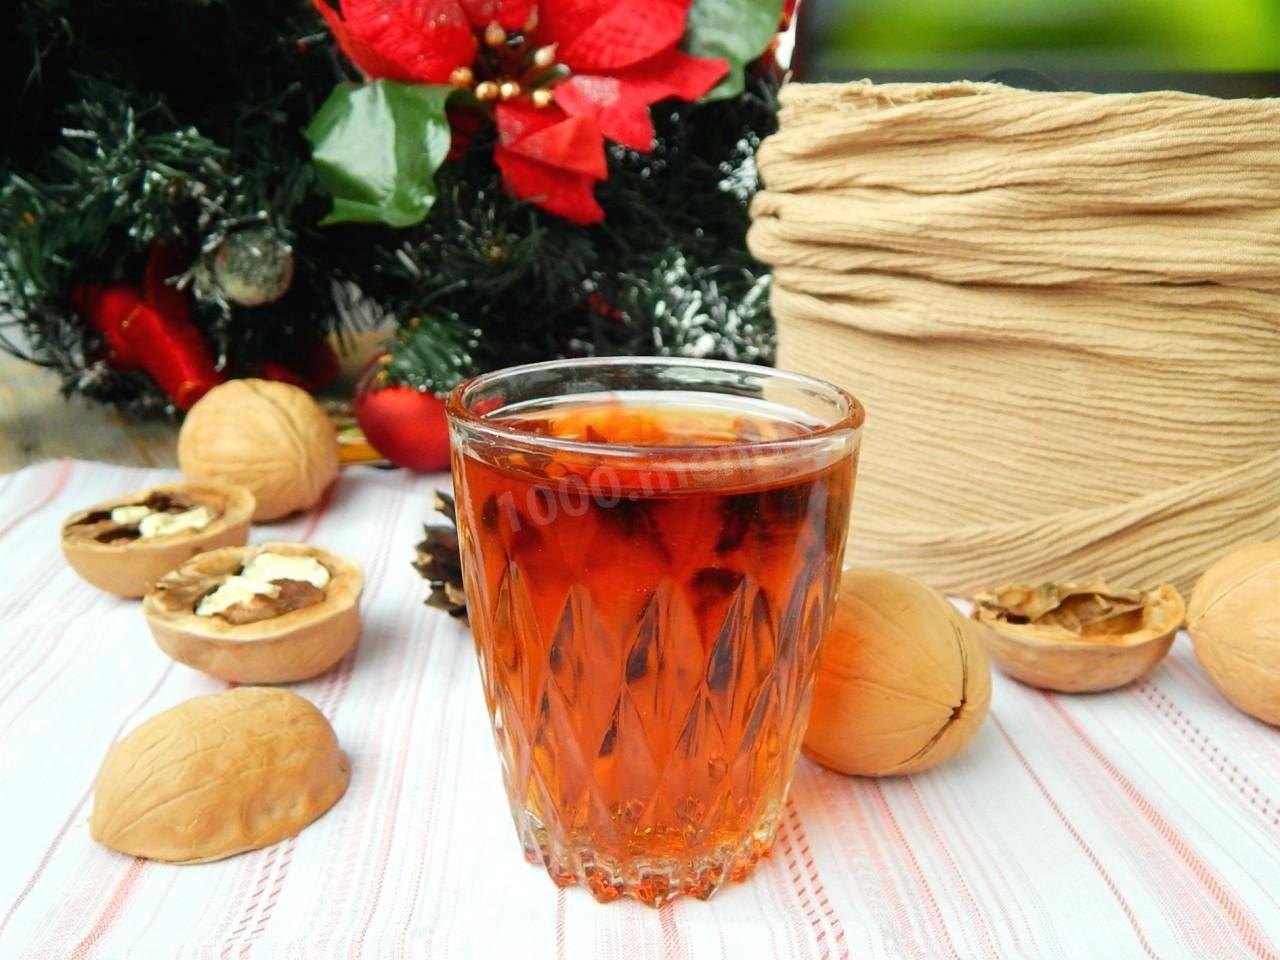 Как приготовить настойку на перегородках грецкого ореха на самогоне в домашних условиях